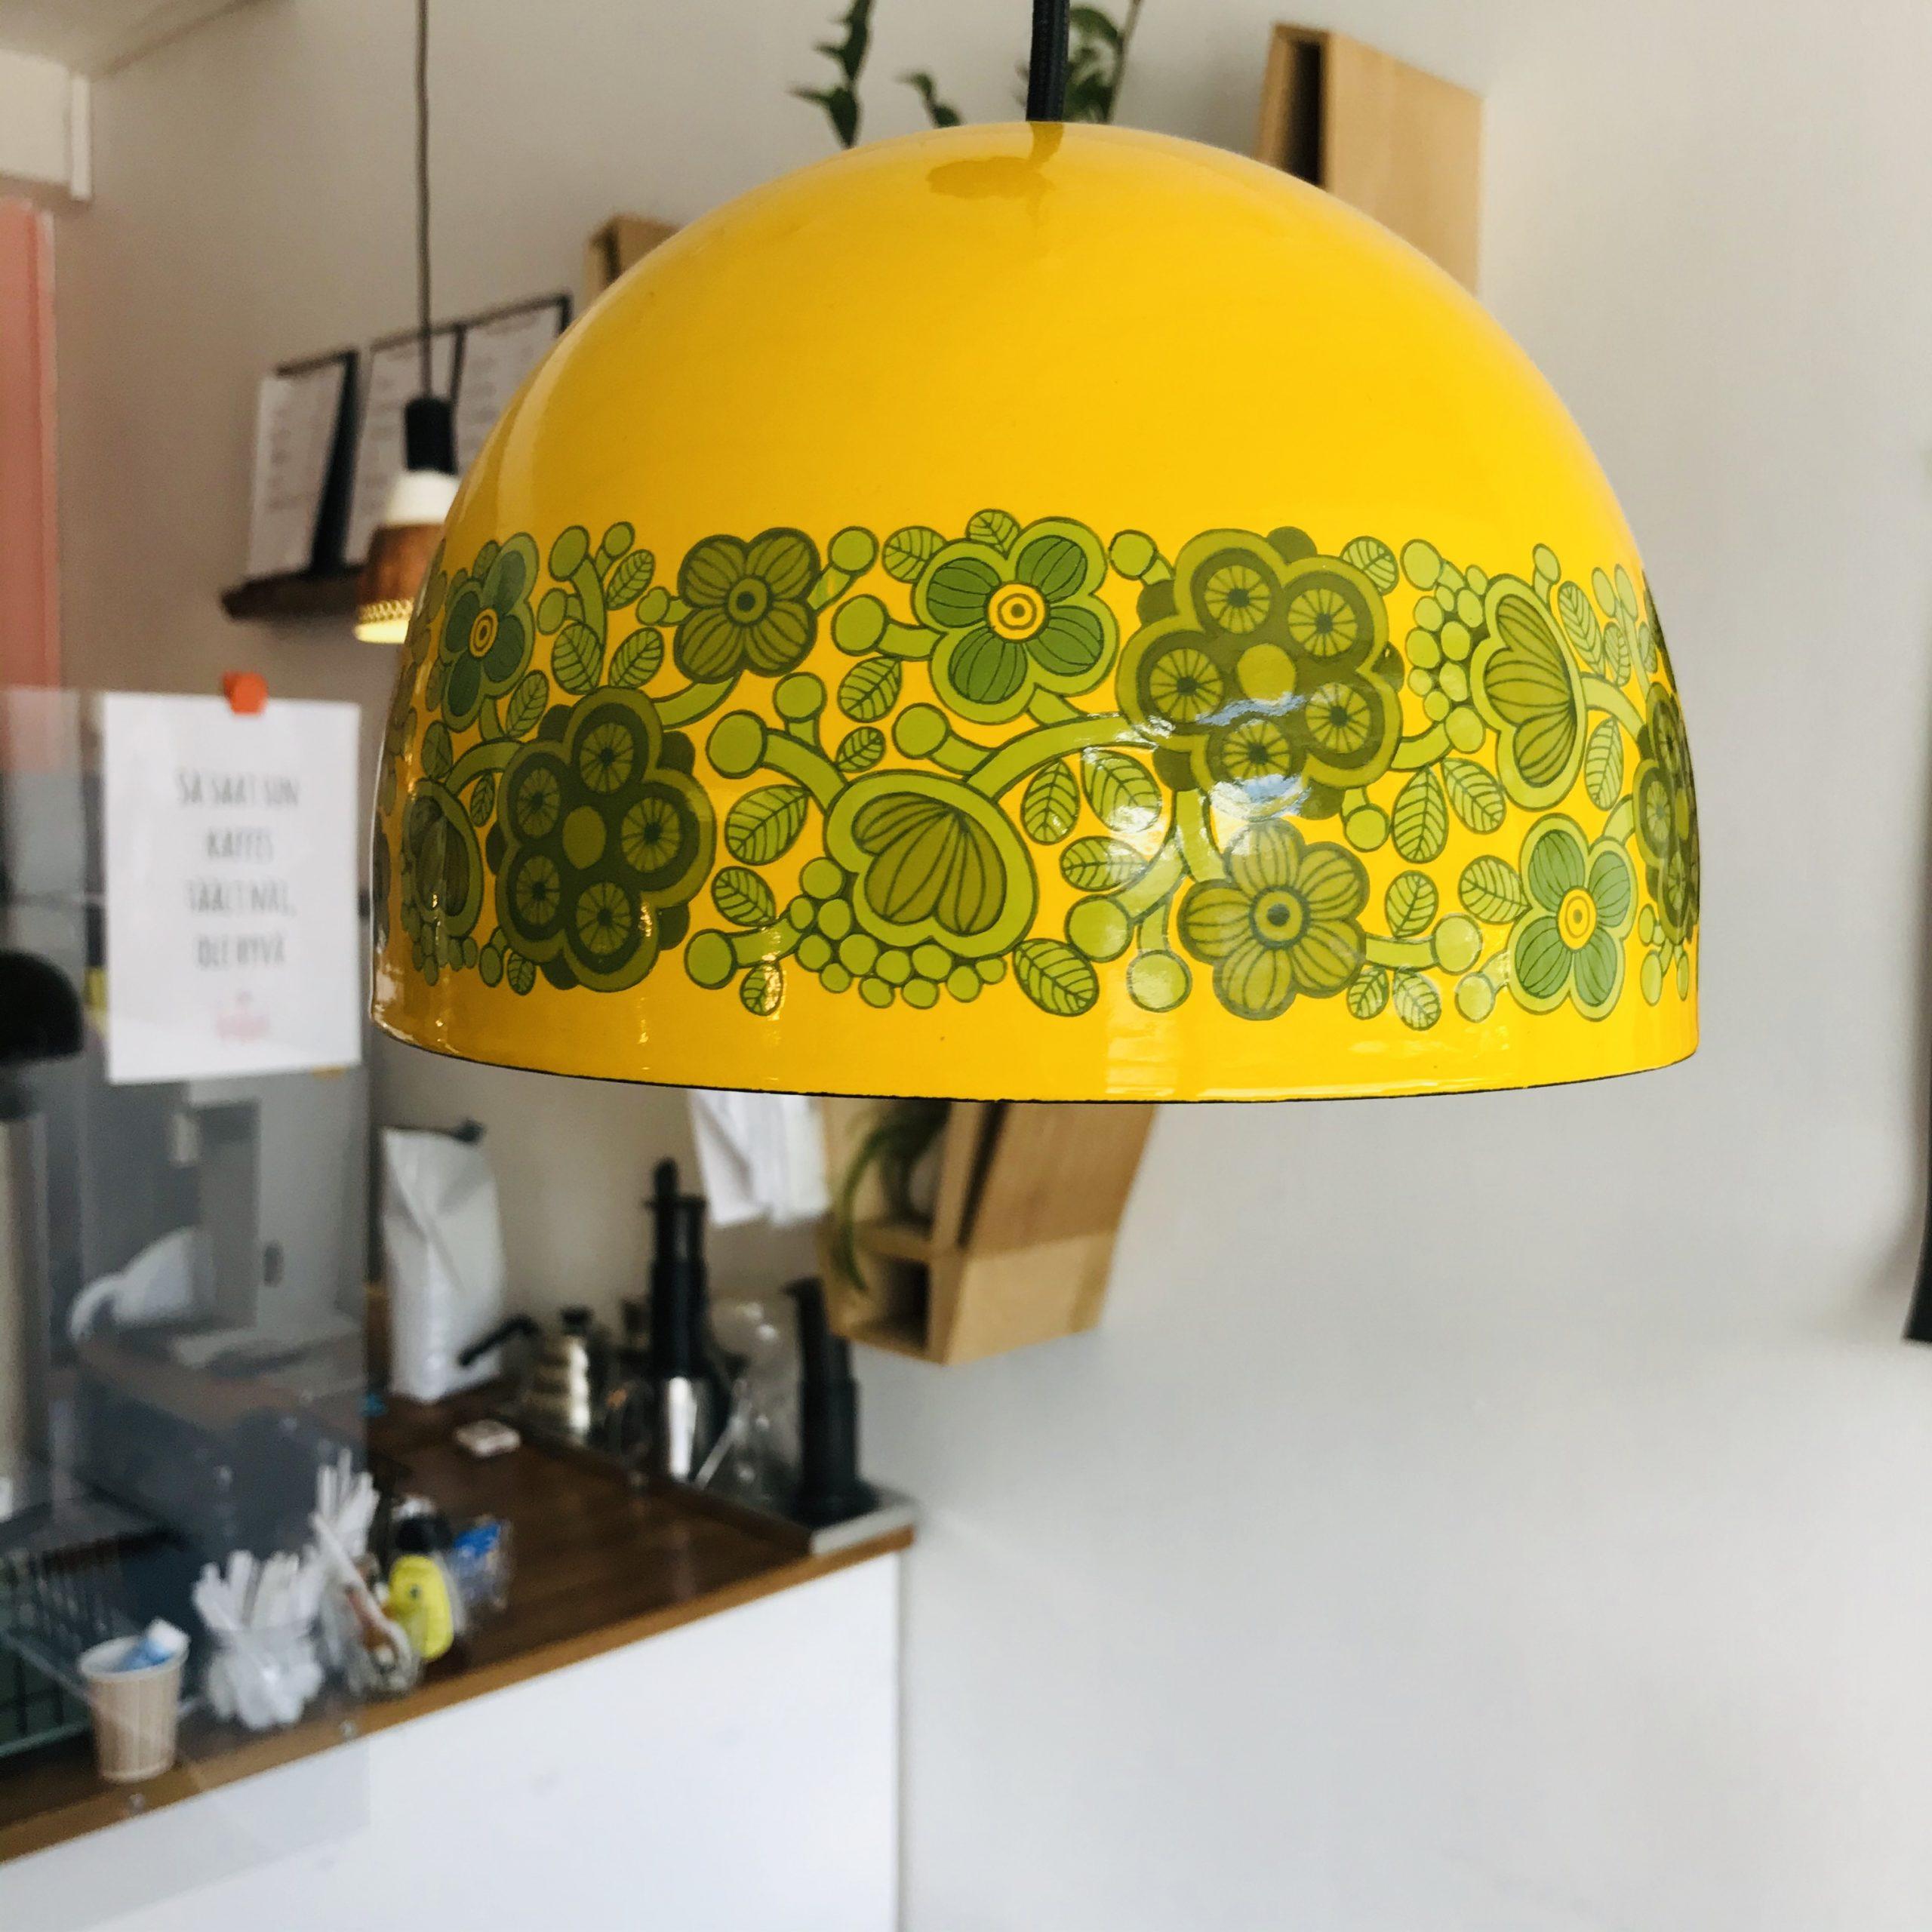 Elluyellow Gaggui Kaffelan keltainen primavera lamppu